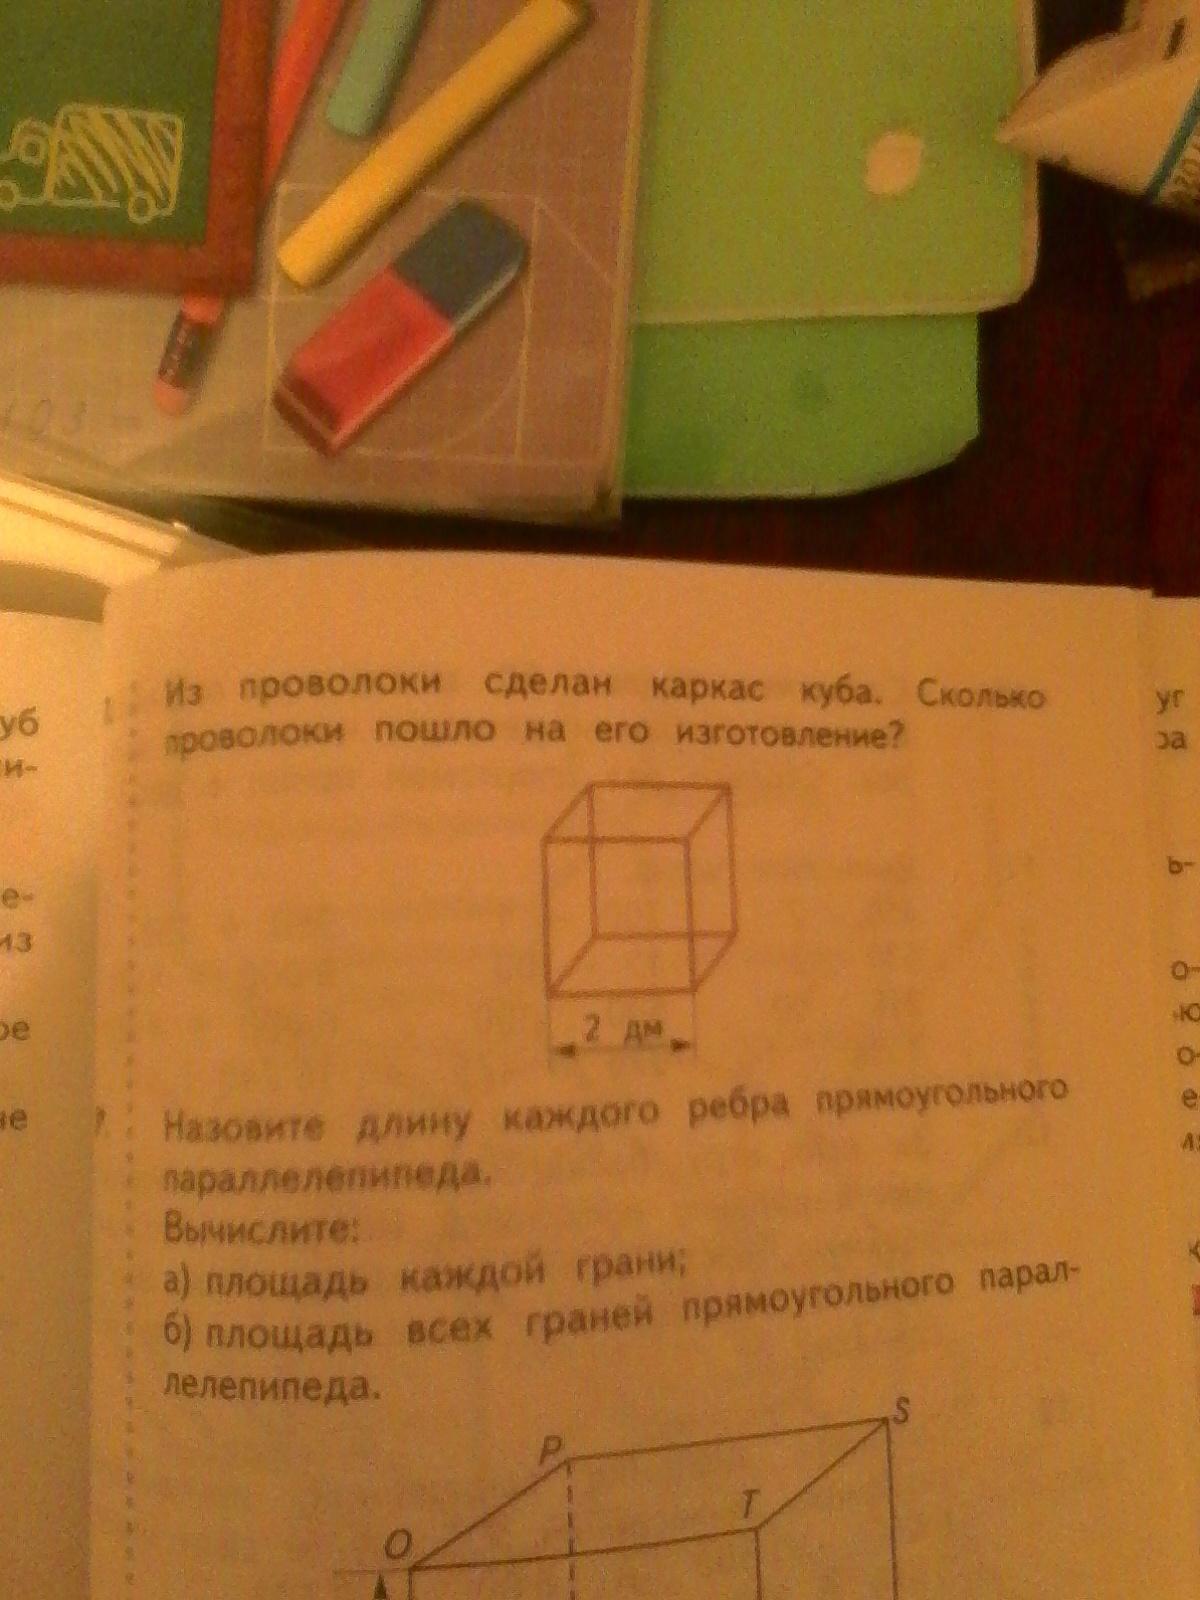 Решение задачи каркас куба задачи на ндс и их решения